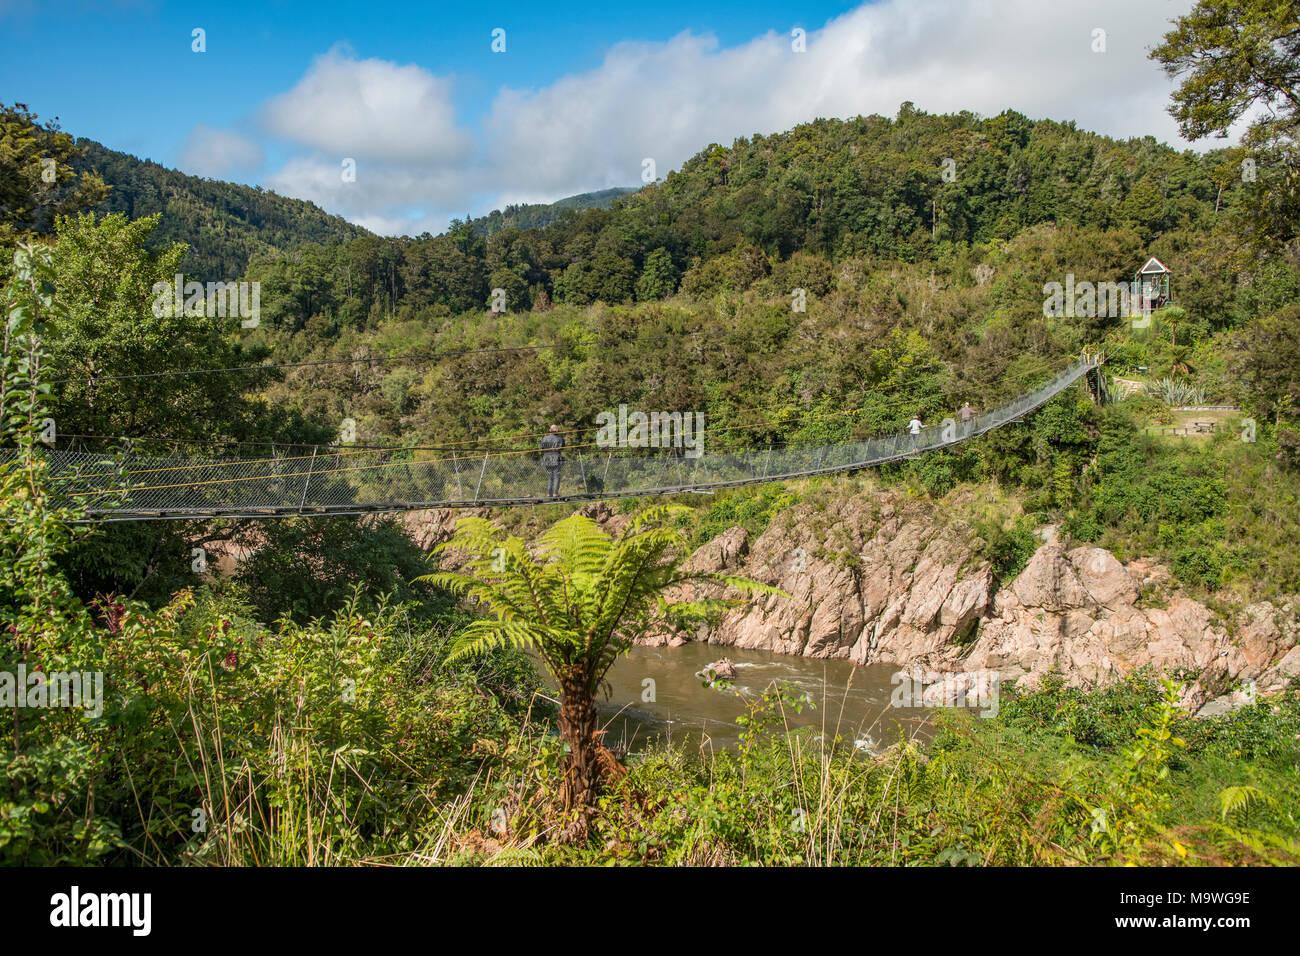 Swingbridge over Upper Buller Gorge, South Island, New Zealand - Stock Image